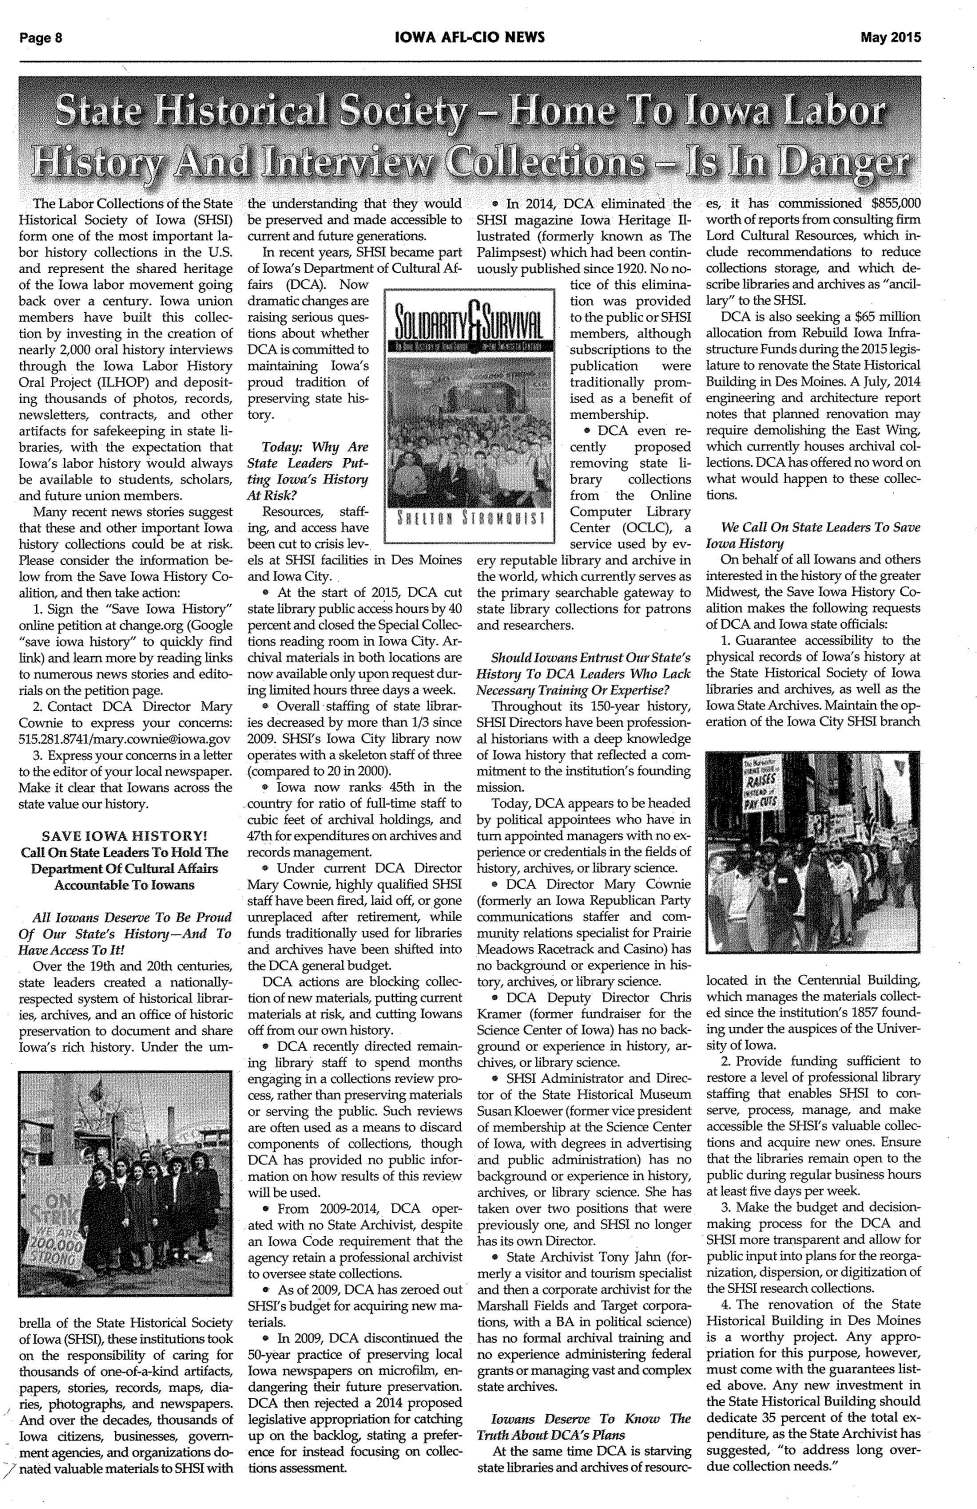 Iowa AFL-CIO News.May.2105.SHSI